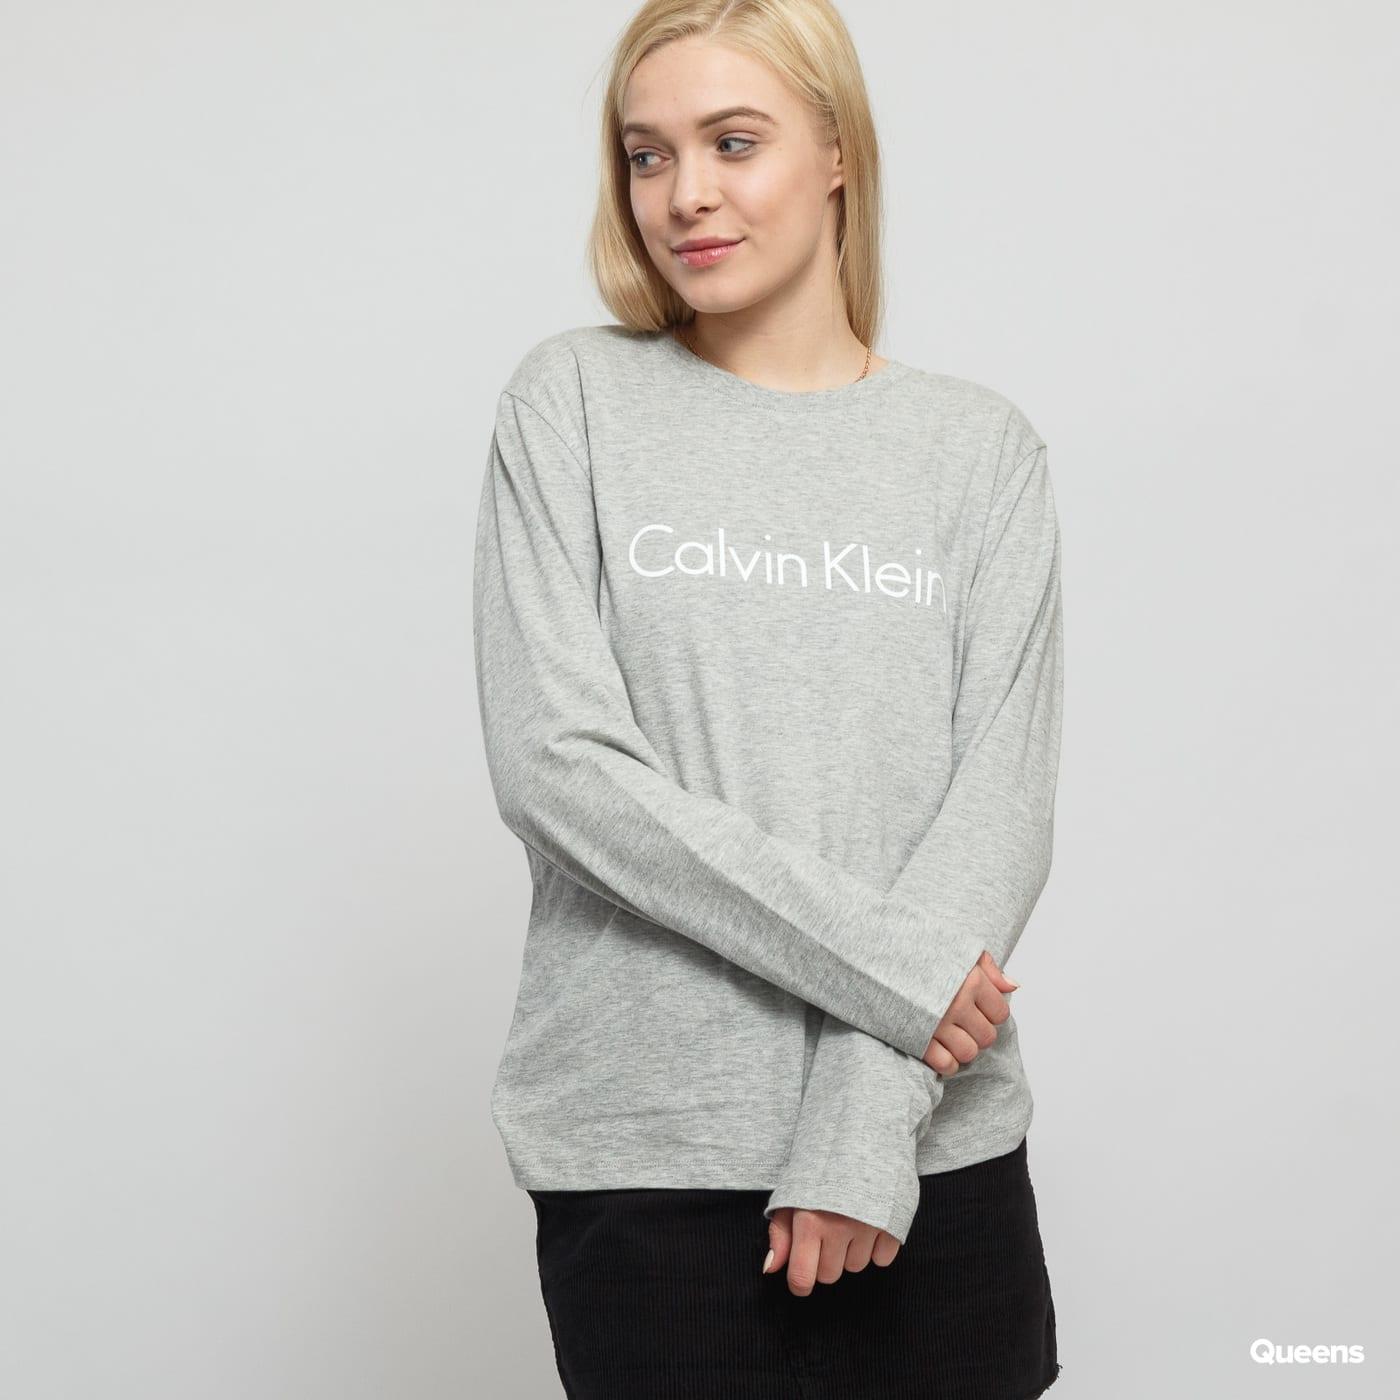 1409f9ebf3ae Dámske tričko s dlhým rukávom Calvin Klein LS Crew Neck C O (QS6164E-020)–  Queens 💚